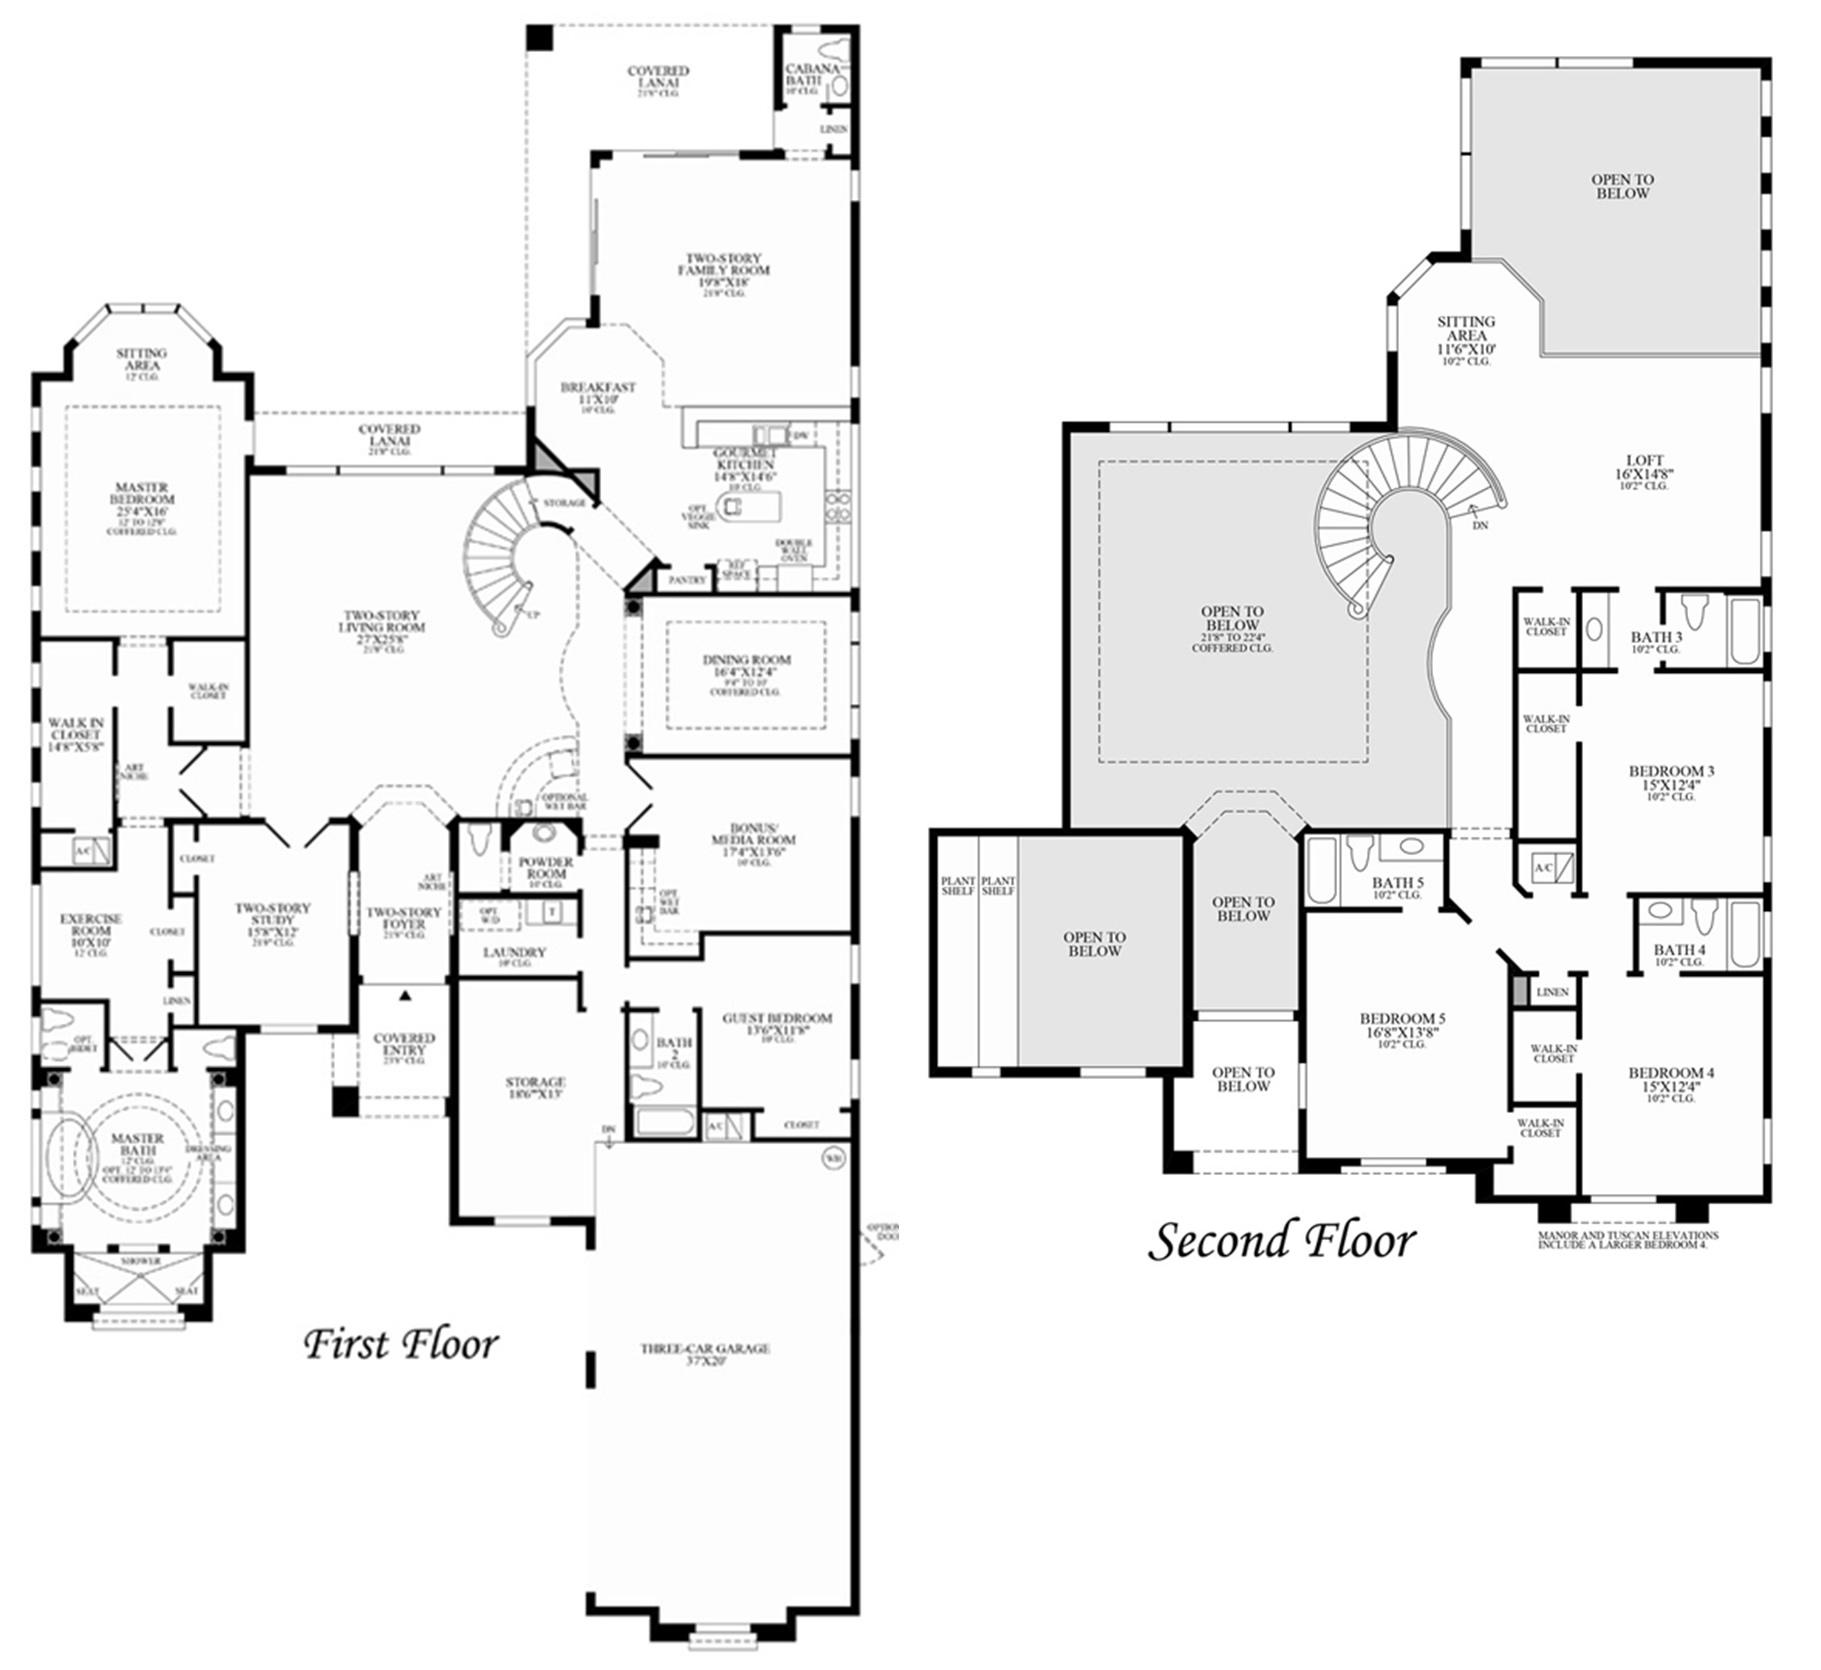 Casa Fortuna Floor Plan